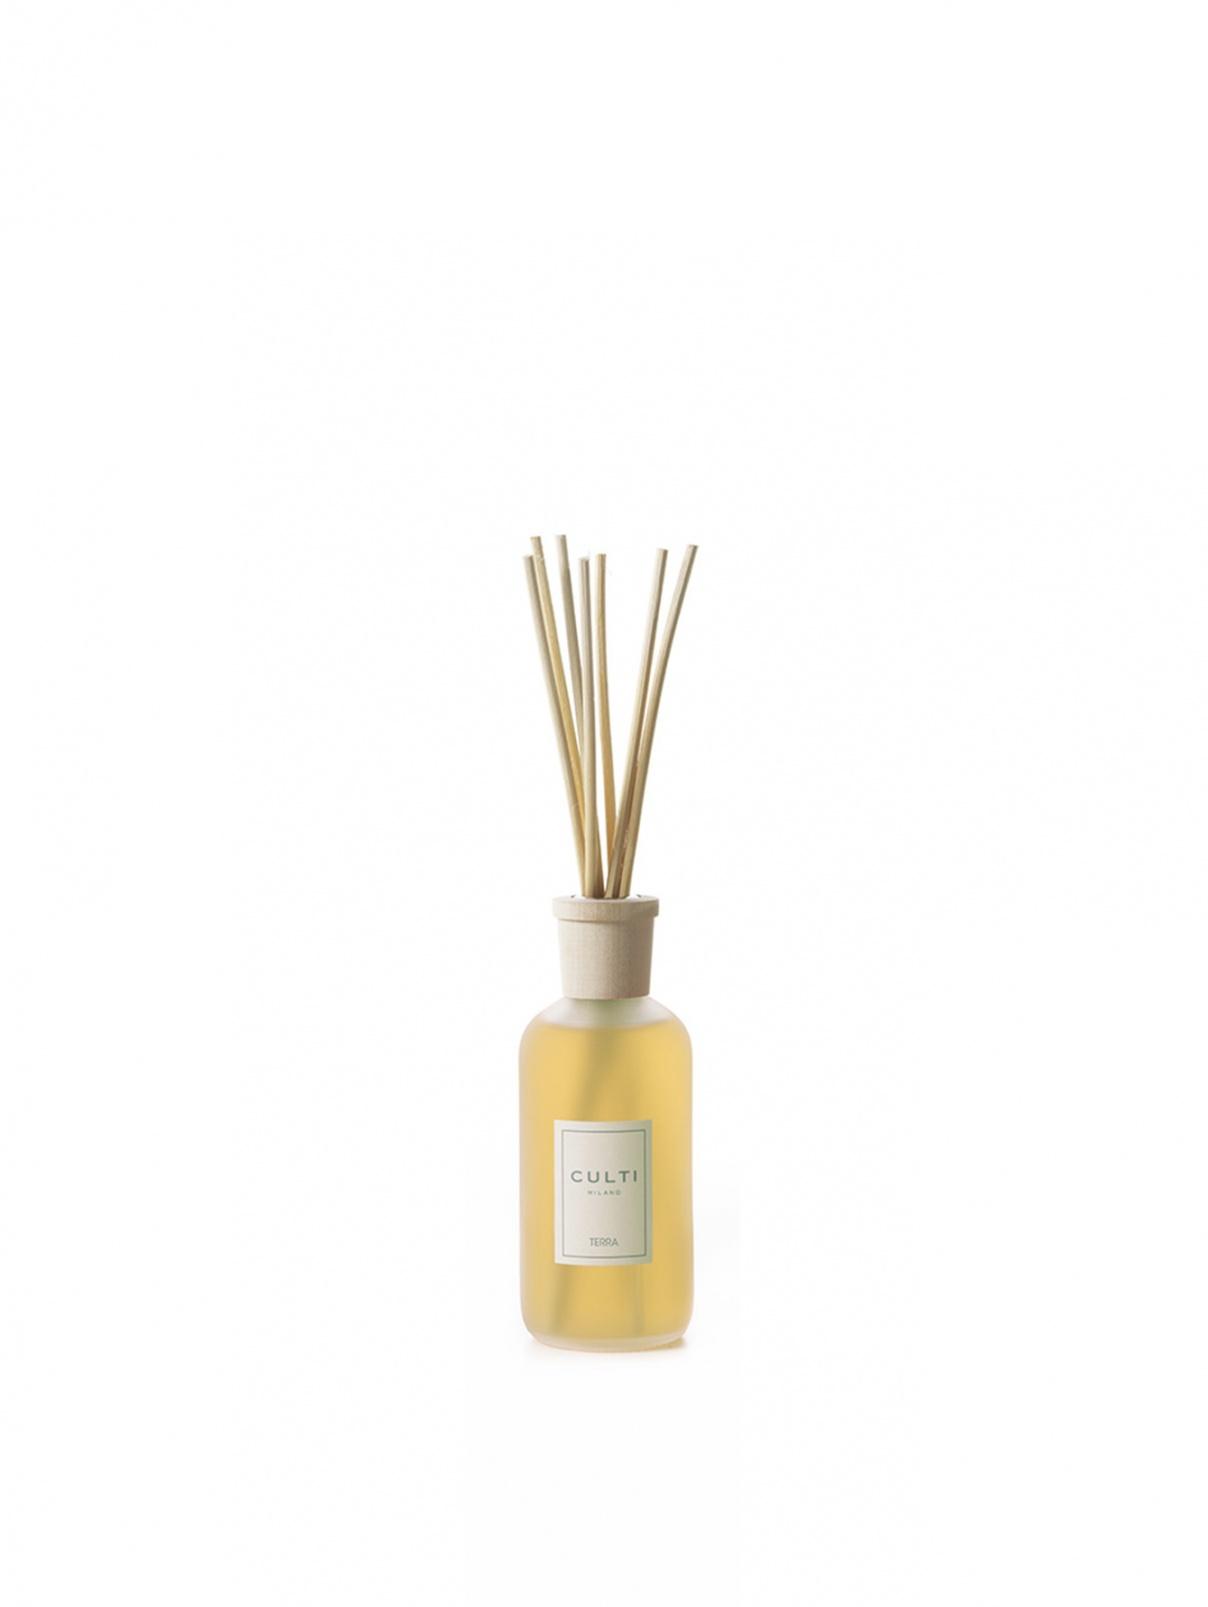 Stile Classic диффузор Terra 250 мл Home Fragrance Culti Milano  –  Общий вид